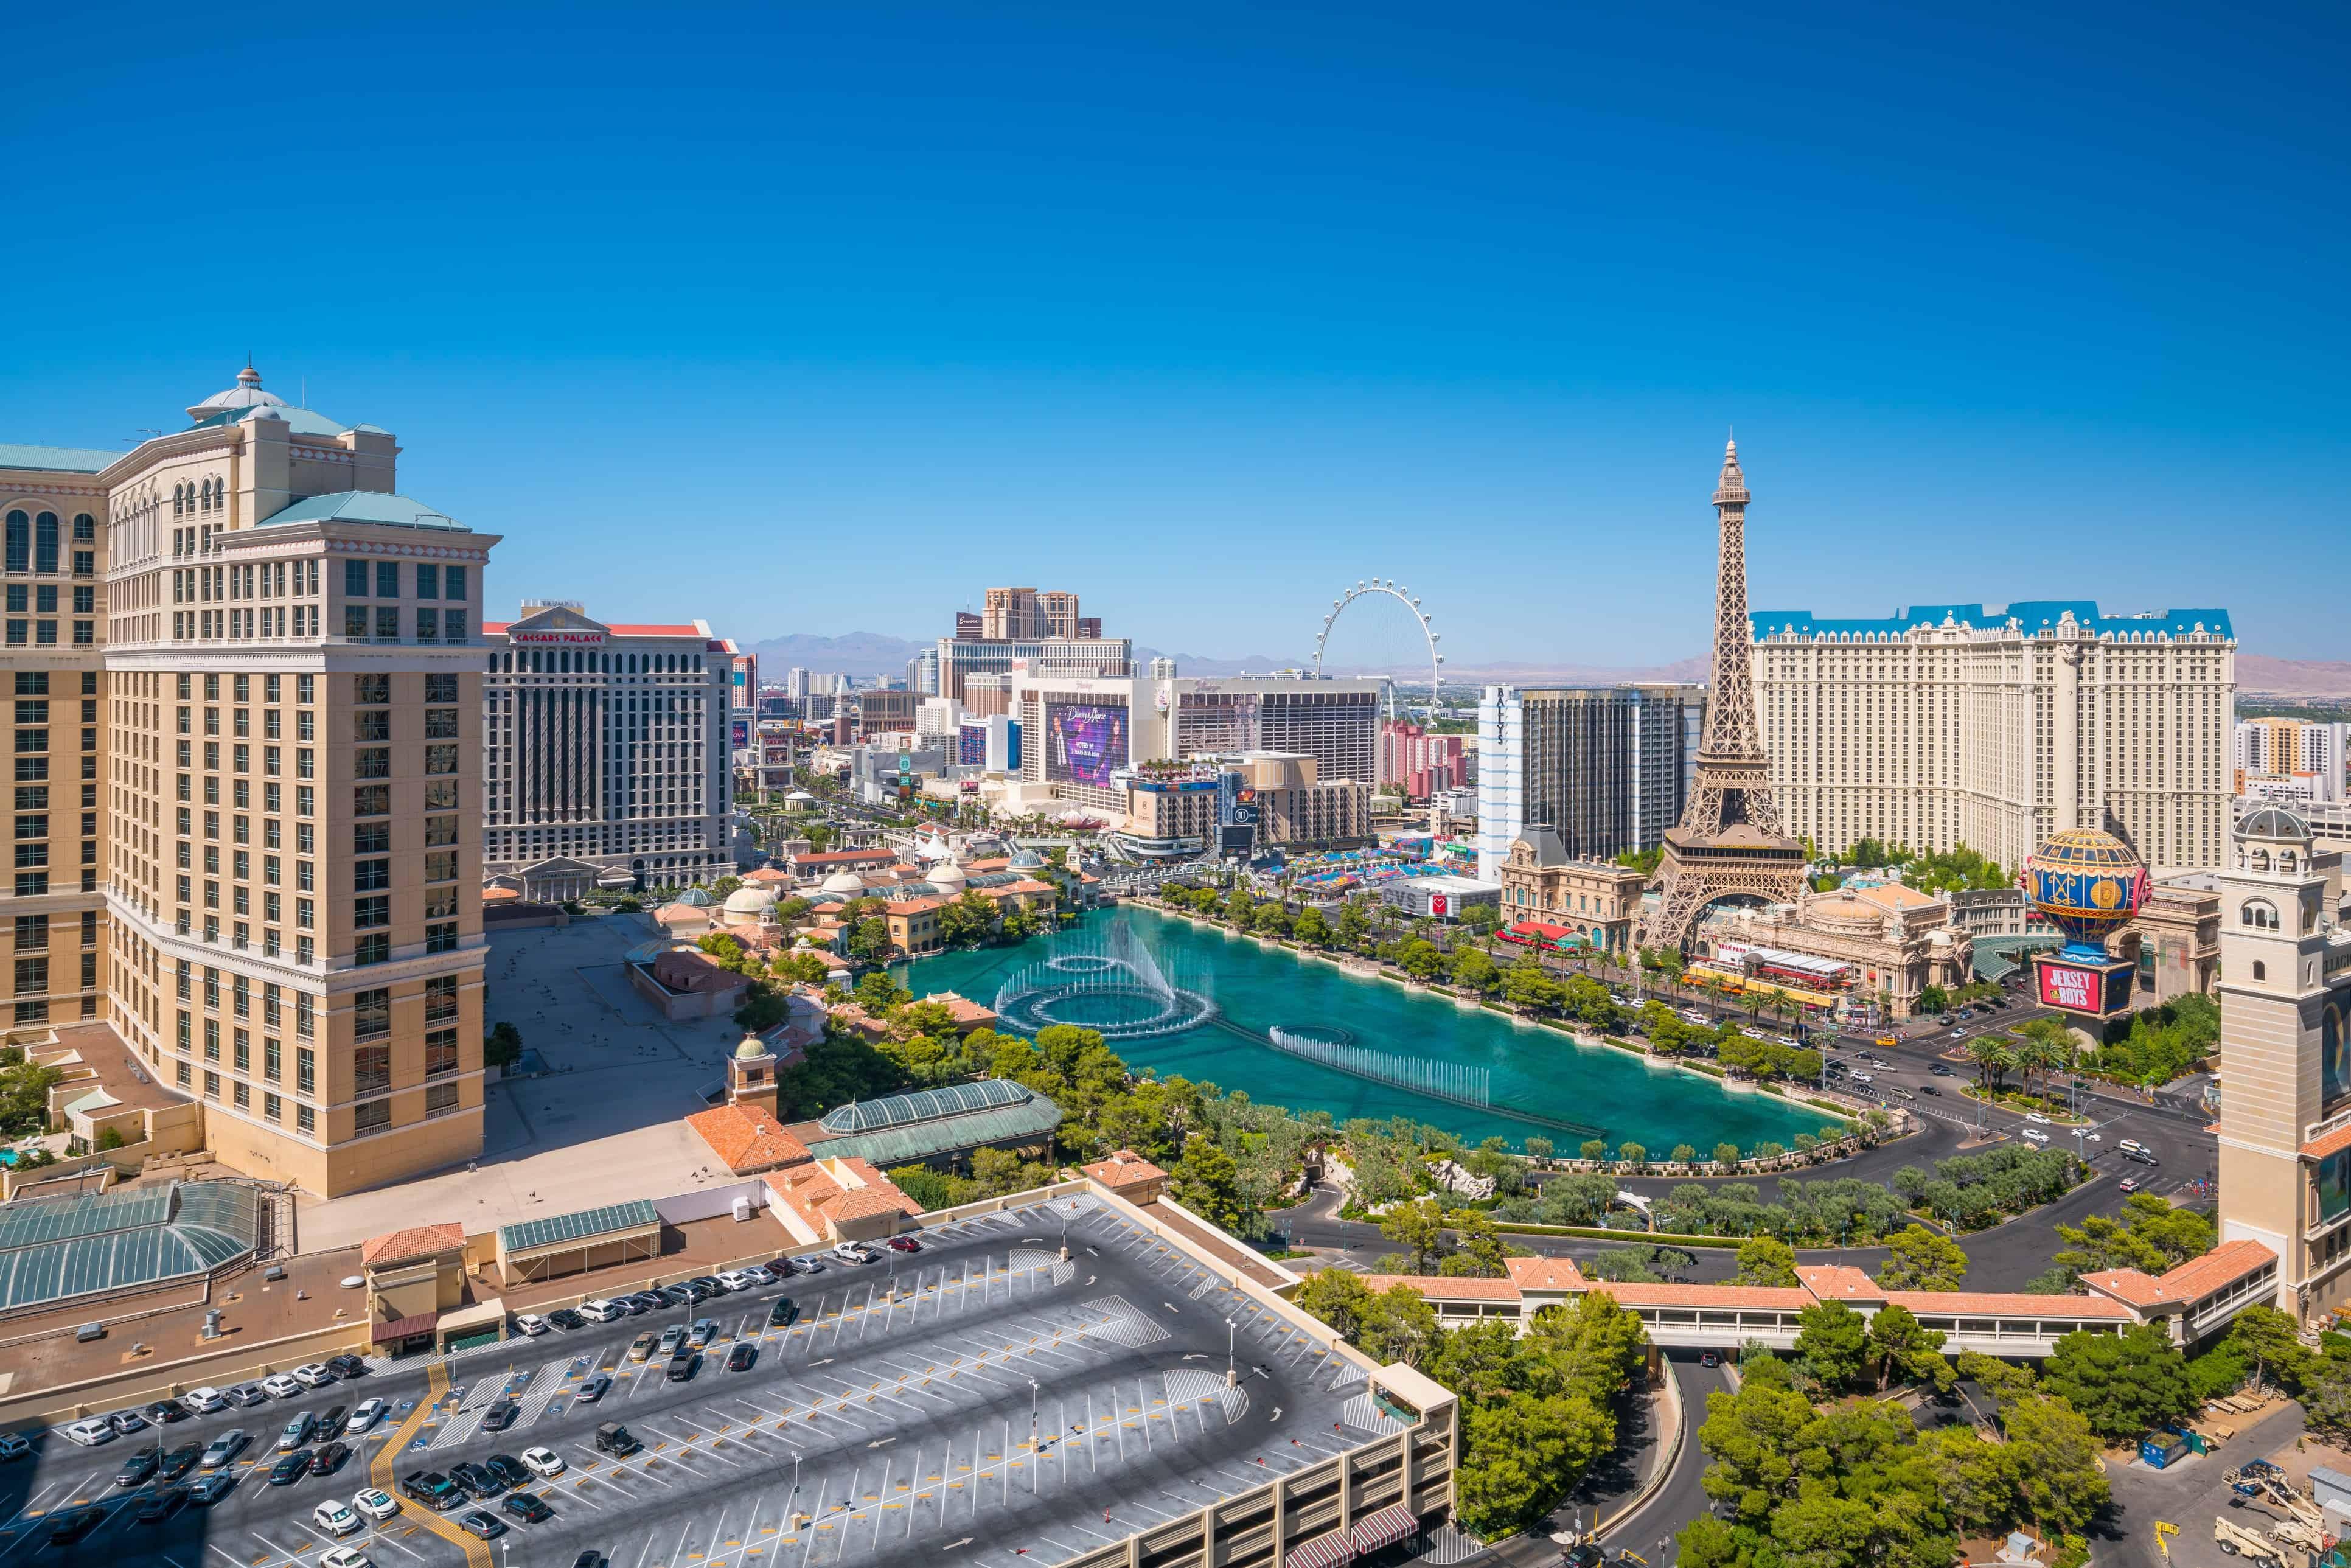 Image of Las Vegas Skyline with text